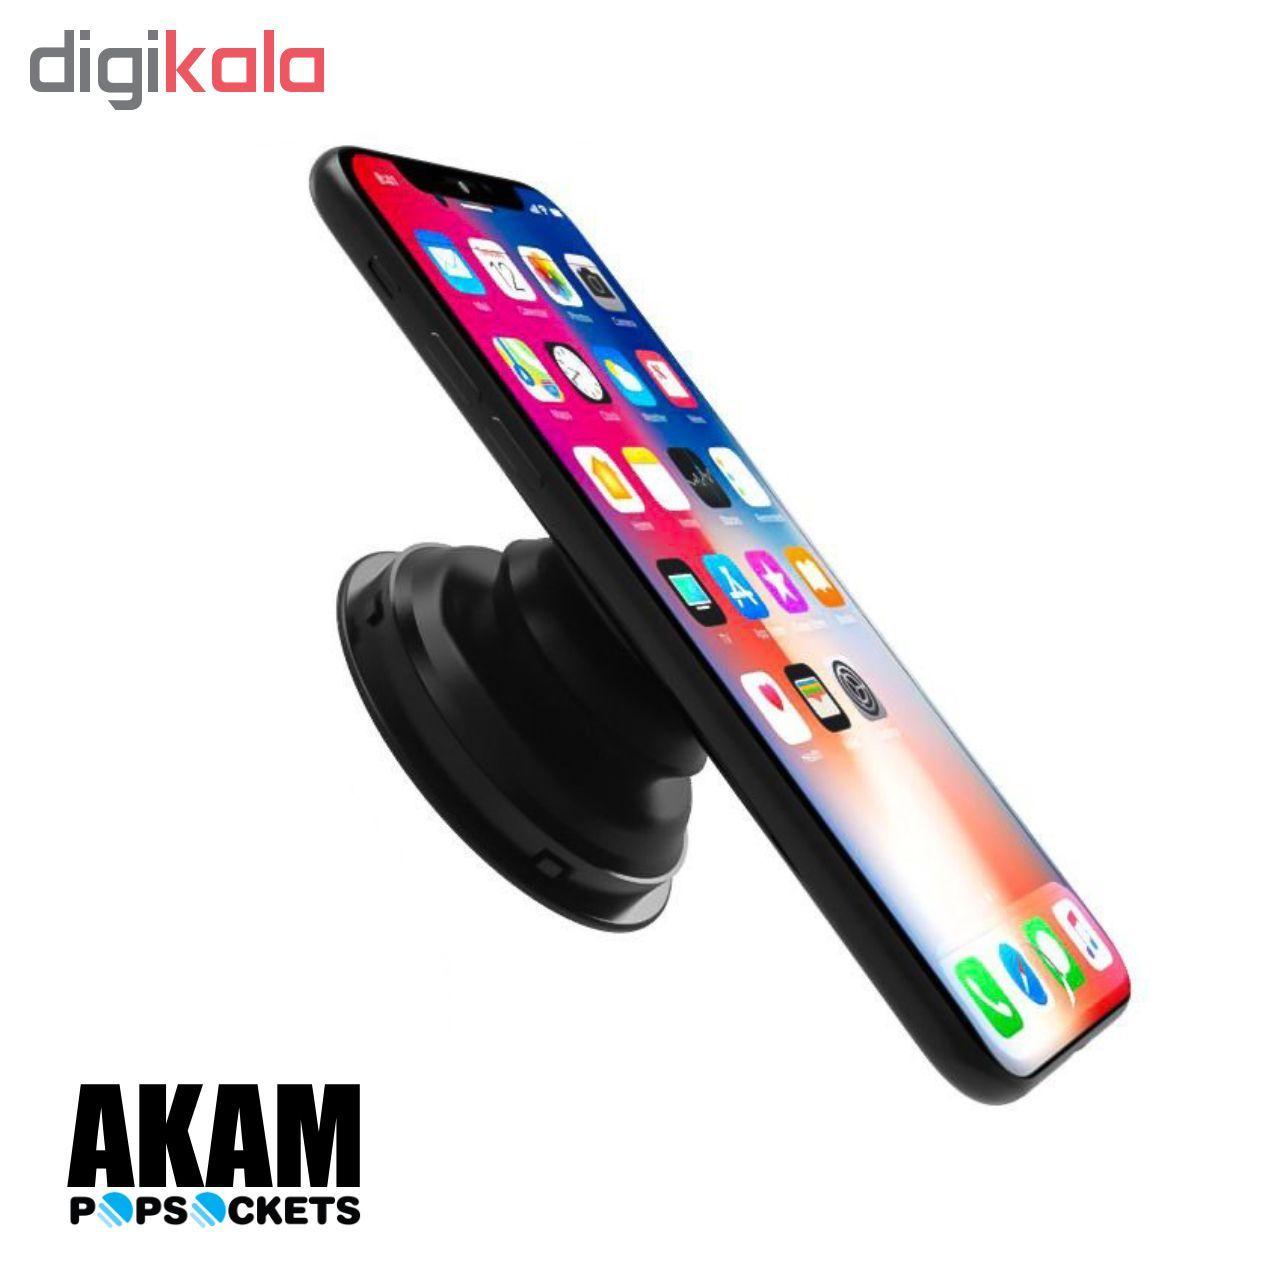 پایه نگهدارنده گوشی موبایل پاپ سوکت آکام مدل APS0021 main 1 9